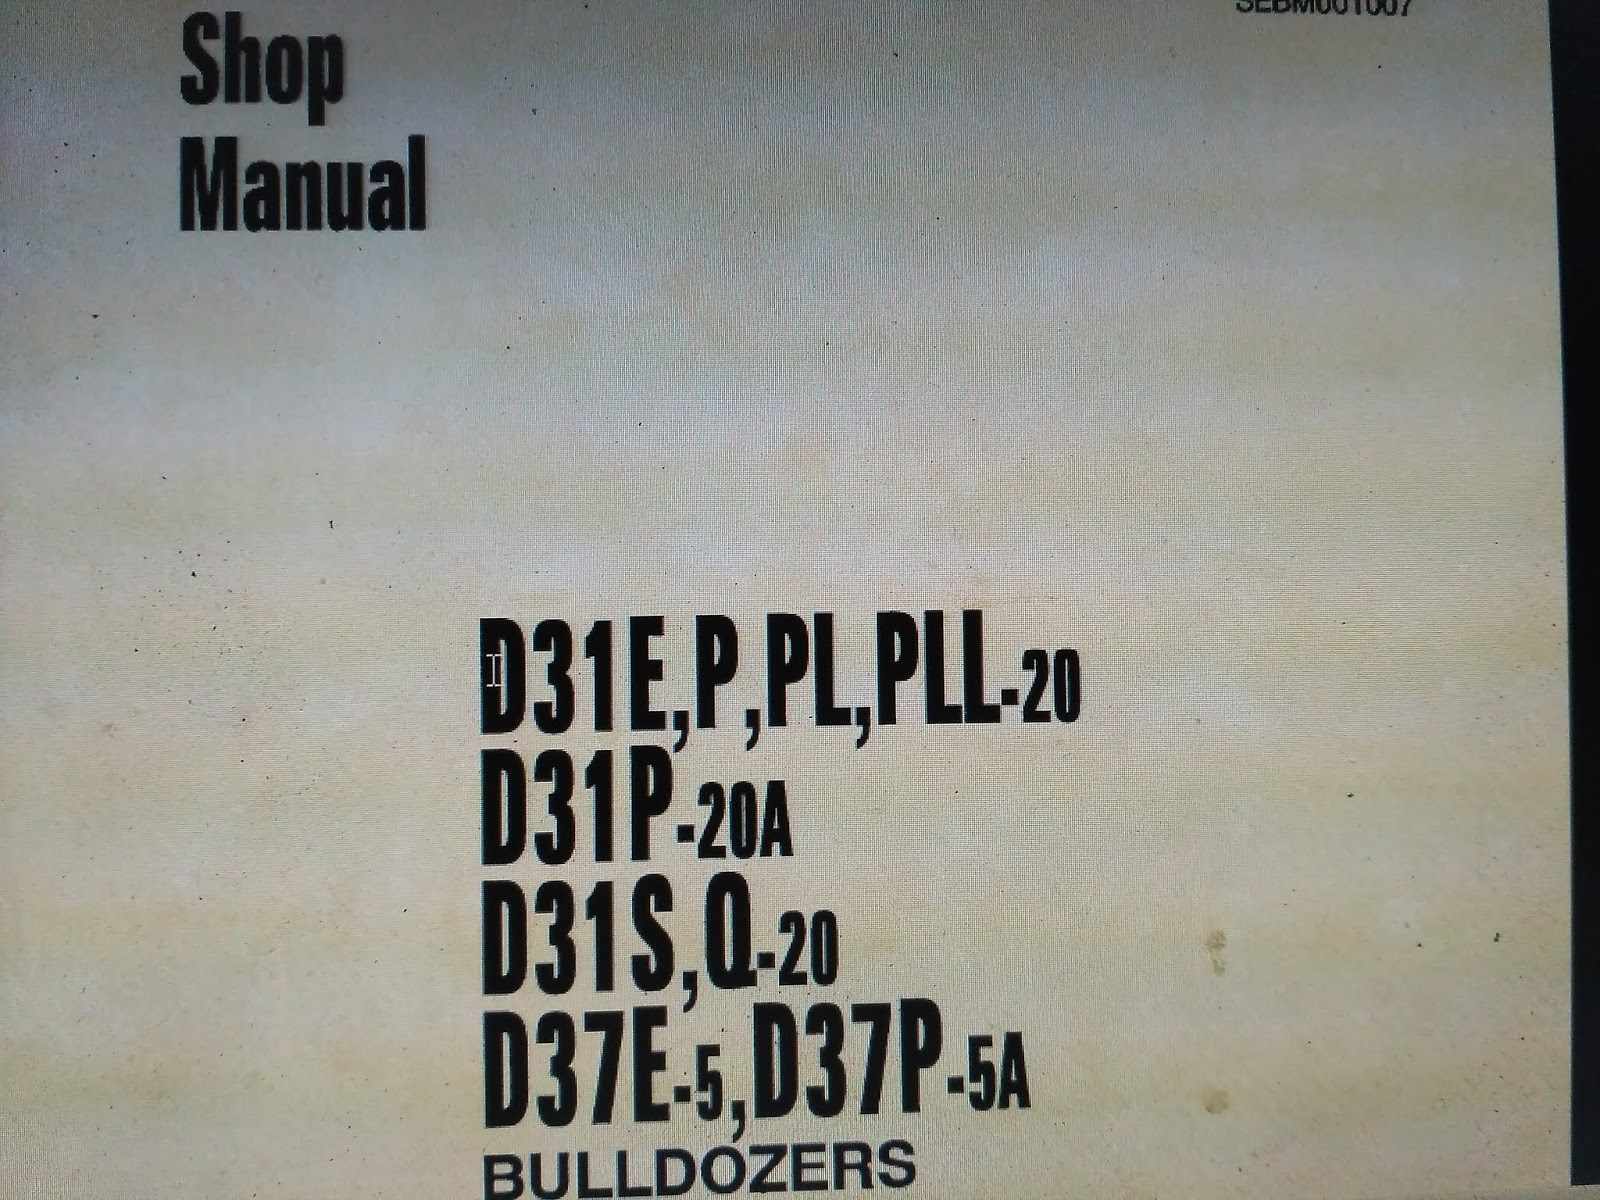 small resolution of d31p 20a d31p 20 d37e 5 d37p 5 tersedia shop manual bulldozer komatsu d31p 20a d31p 20 d37e 5 d37p 5 serta menyediakan shop manual parts manual excavator